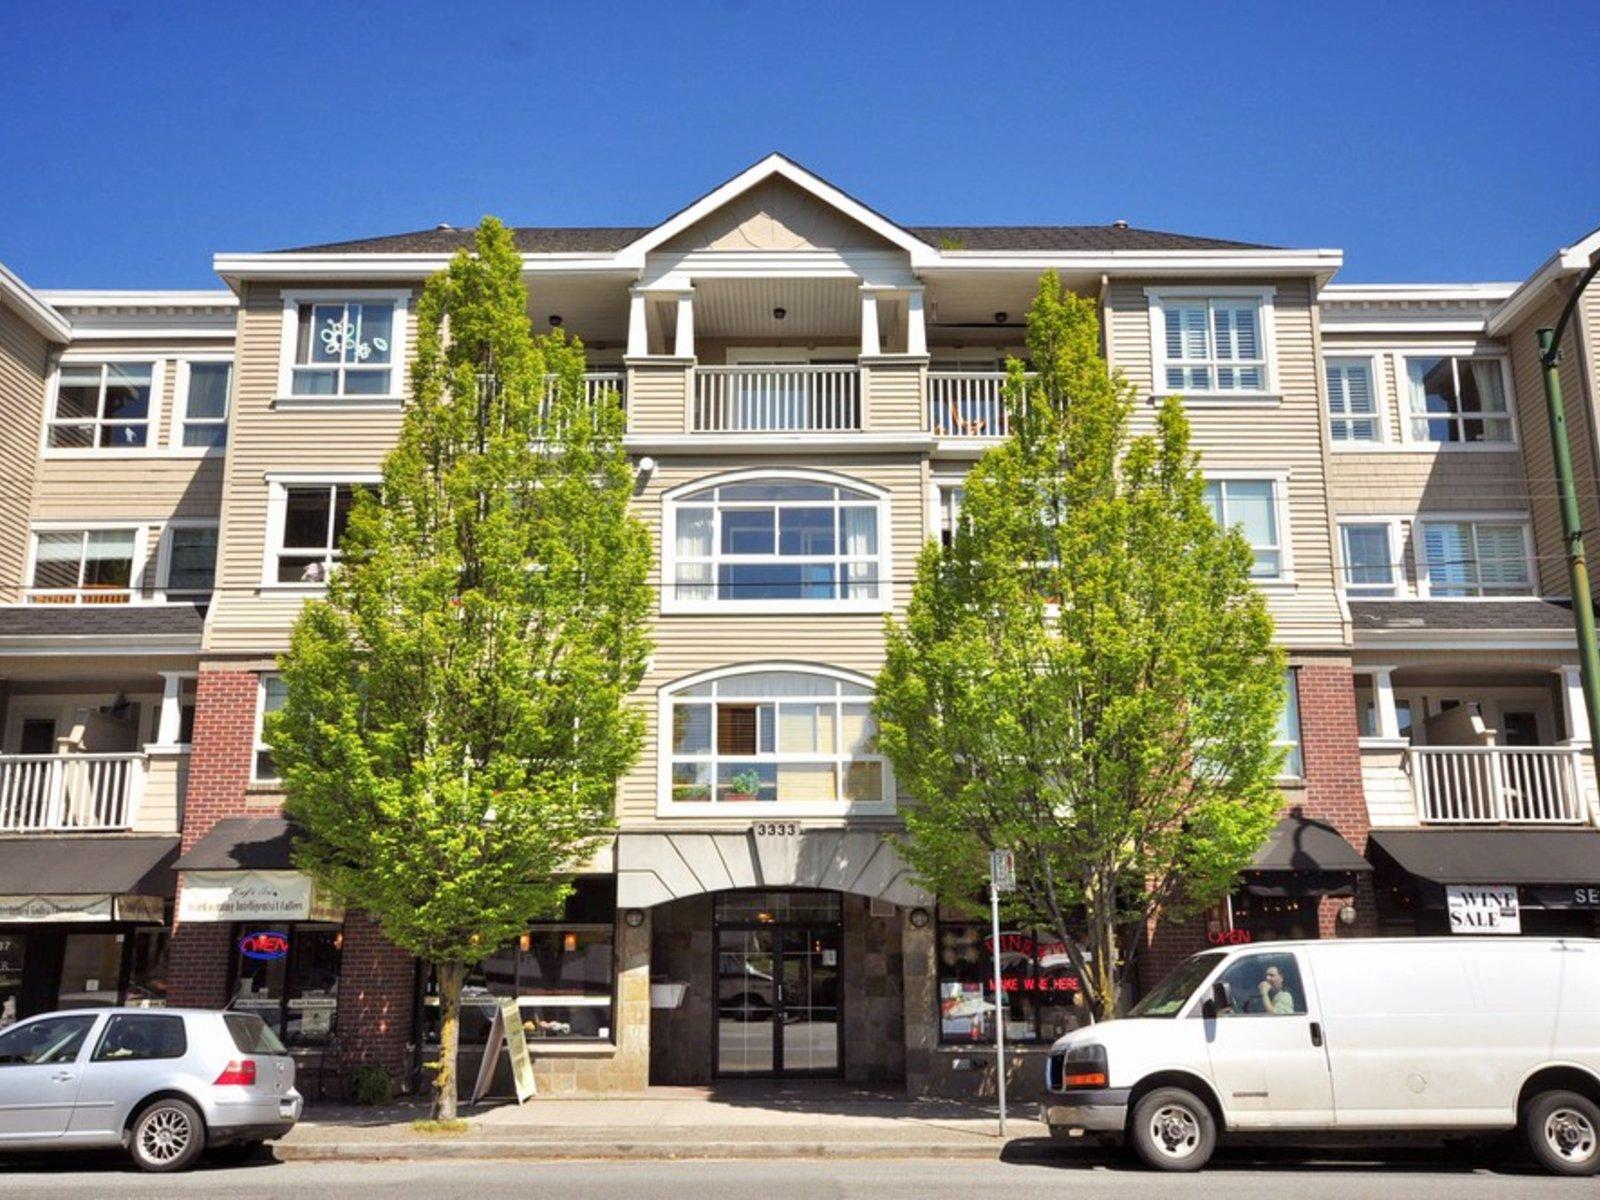 Blenheim Terrace - 3333 4th Ave